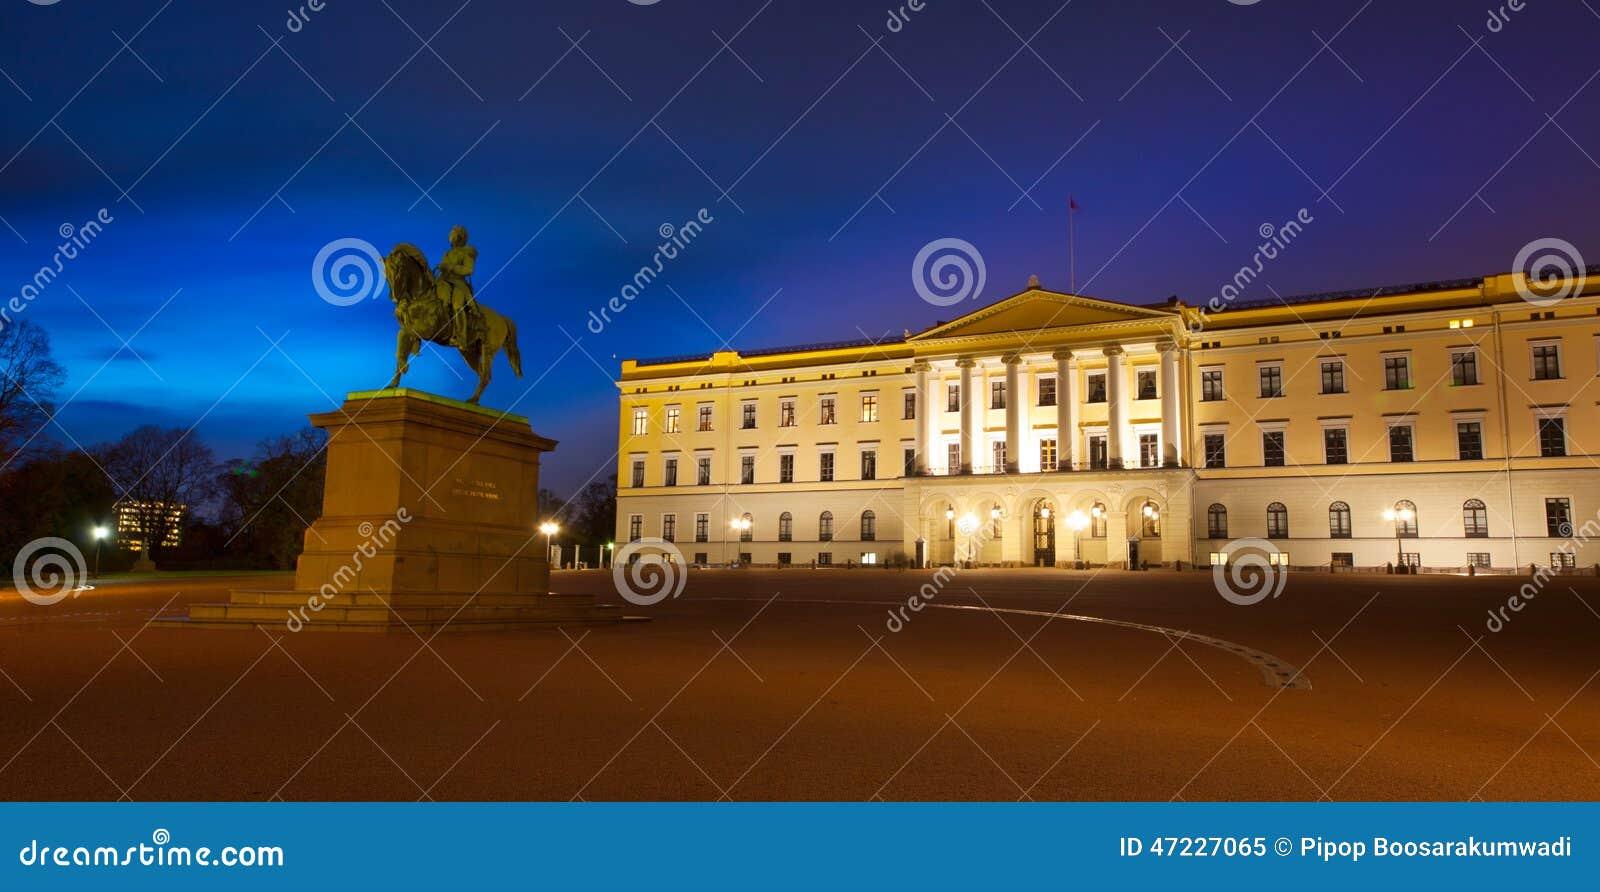 Royal Palace με το άγαλμα του βασιλιά Karl Johan στο Όσλο, Νορβηγία